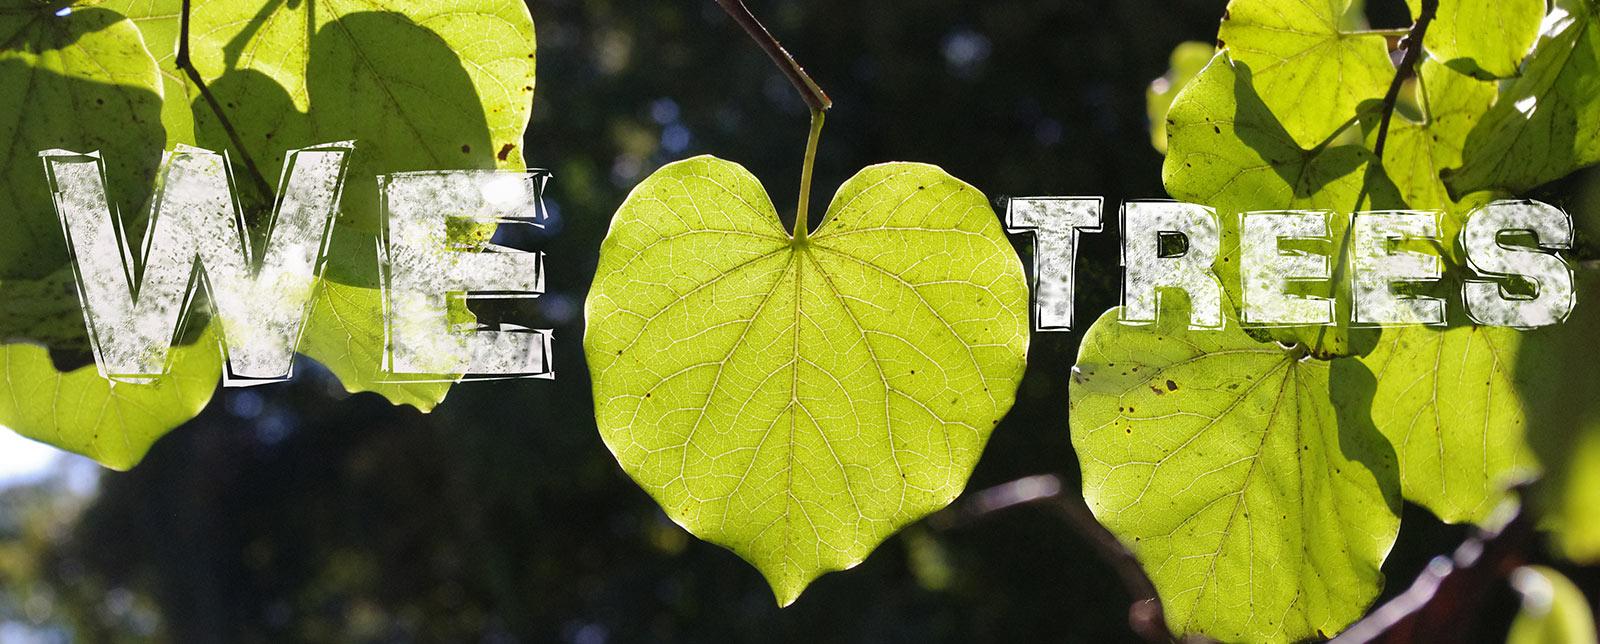 We heart trees